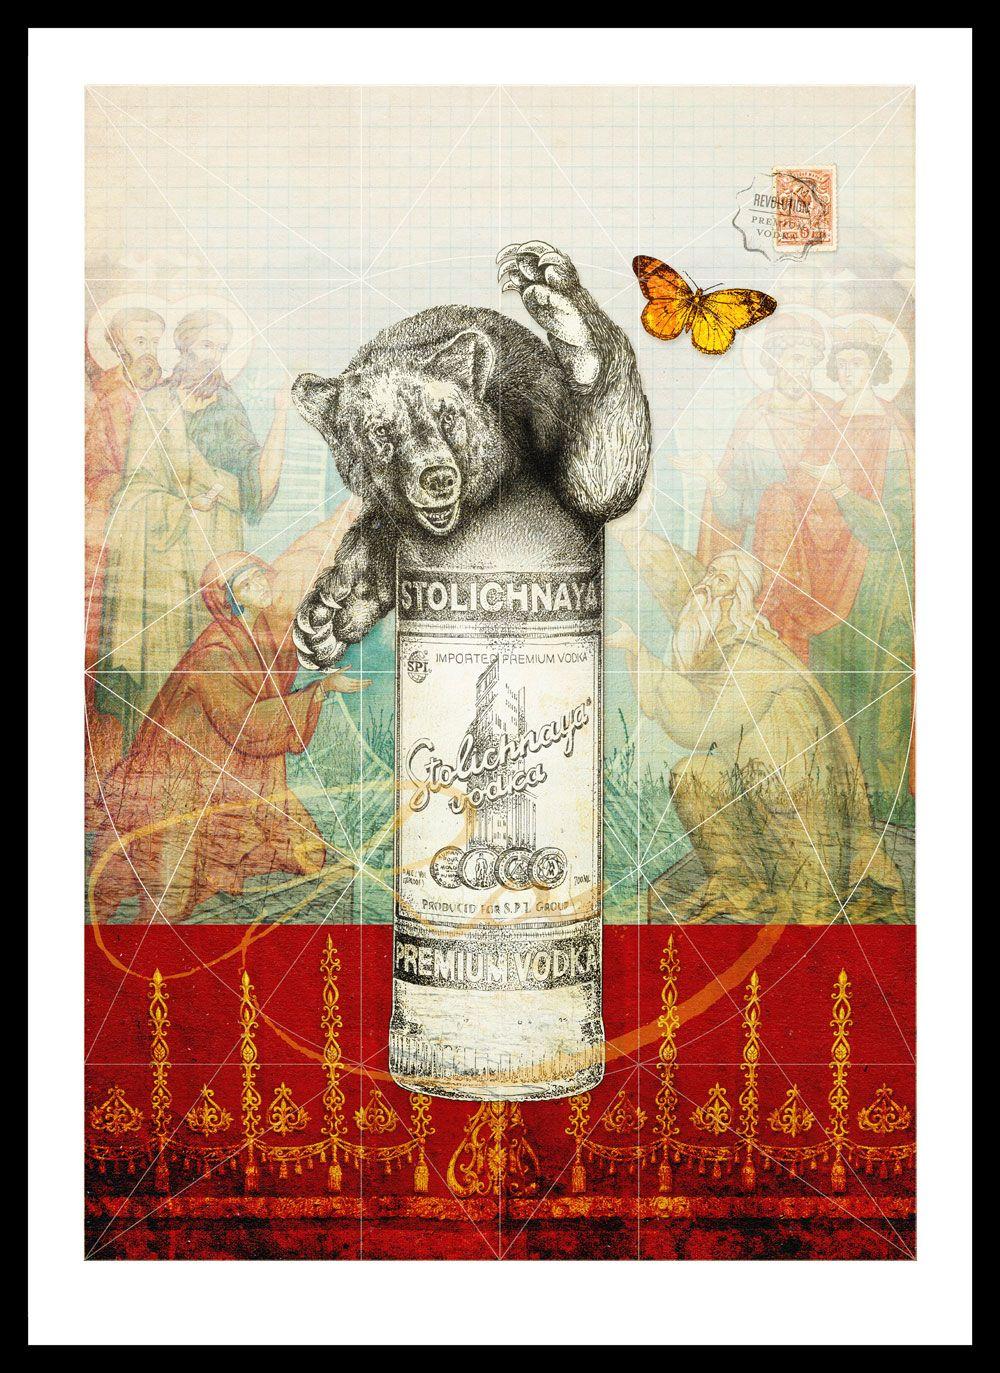 No.3: Stolichnaya Vodka, Russia.  Part of a series of illustrations for Revolution Vodka Bars demonstrating the provenance of their range of Premium Vodka's.